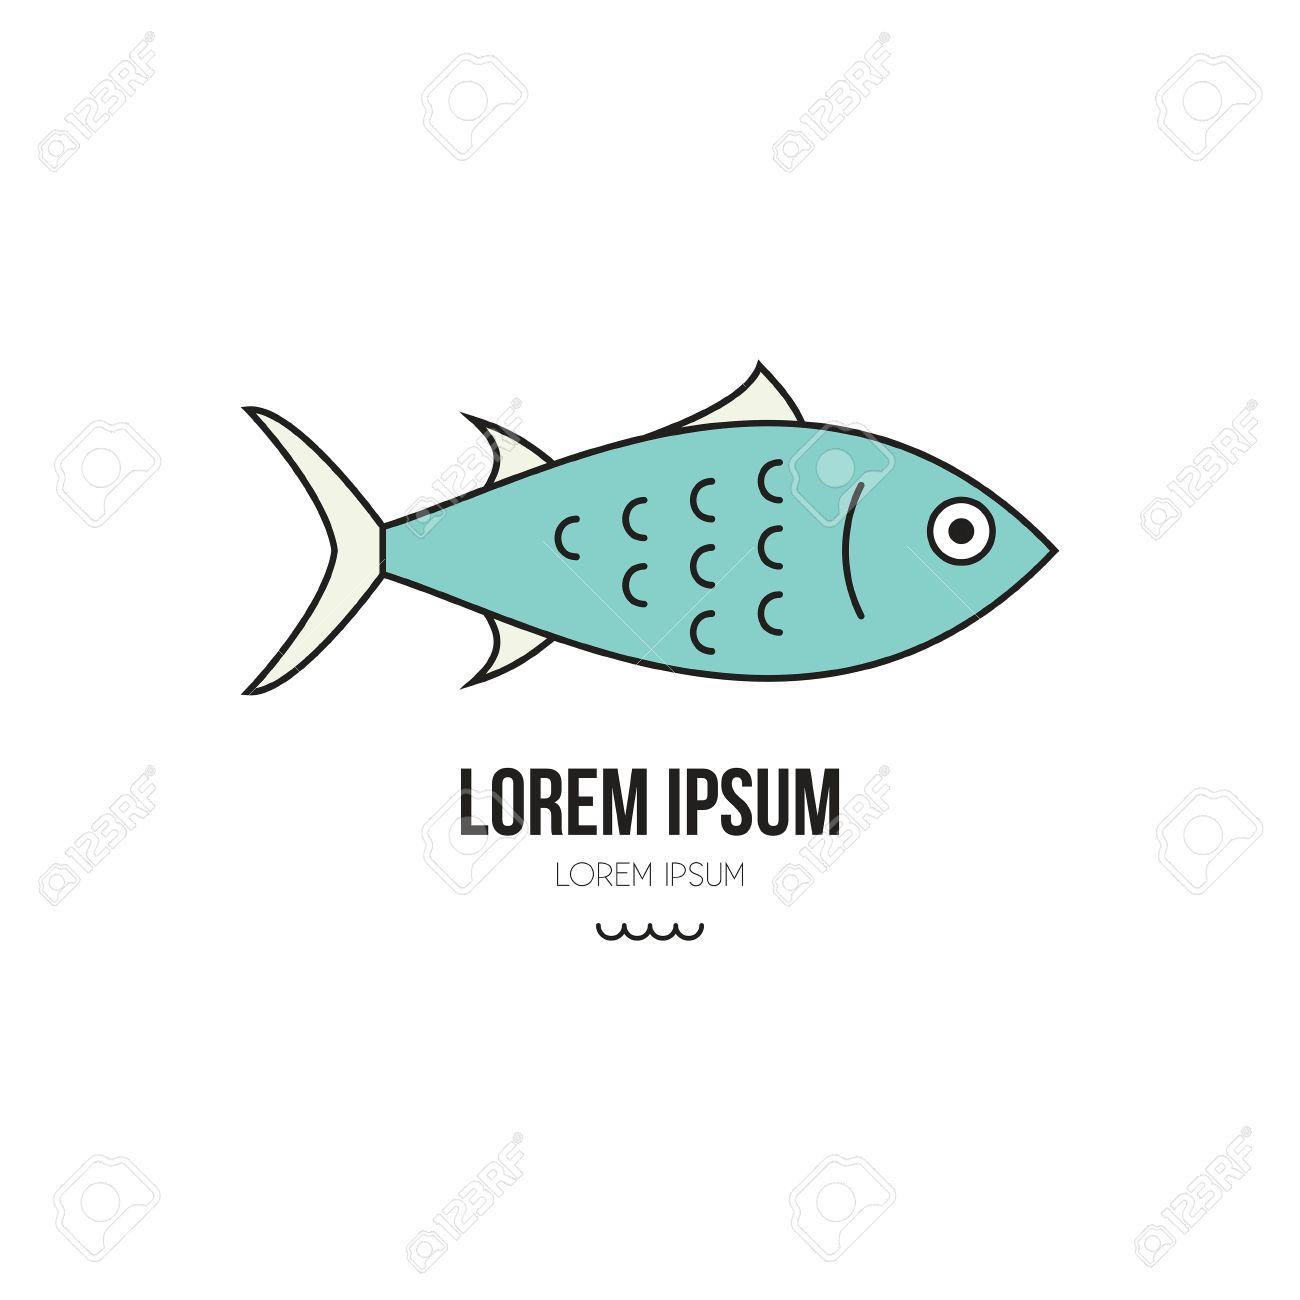 9 492 tuna fish stock vector illustration and royalty free tuna